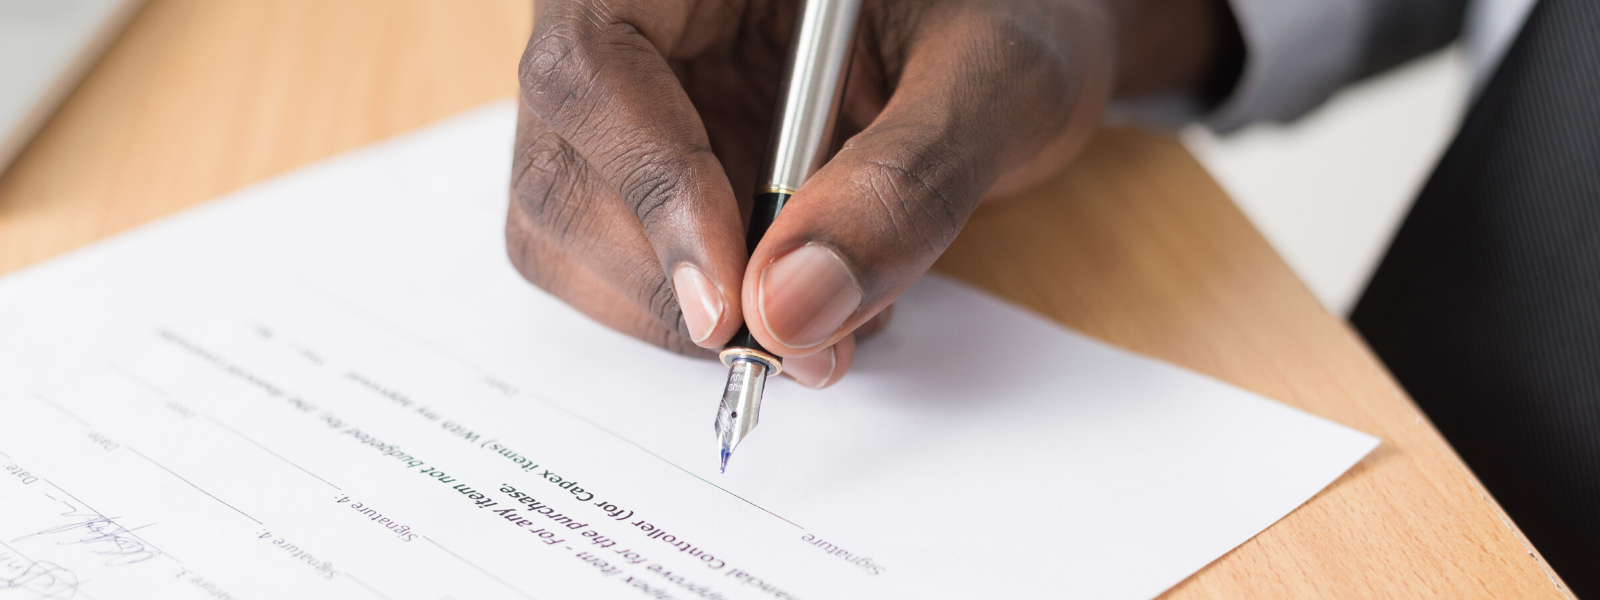 Preventive Law Step #1: Proactive Contract Development